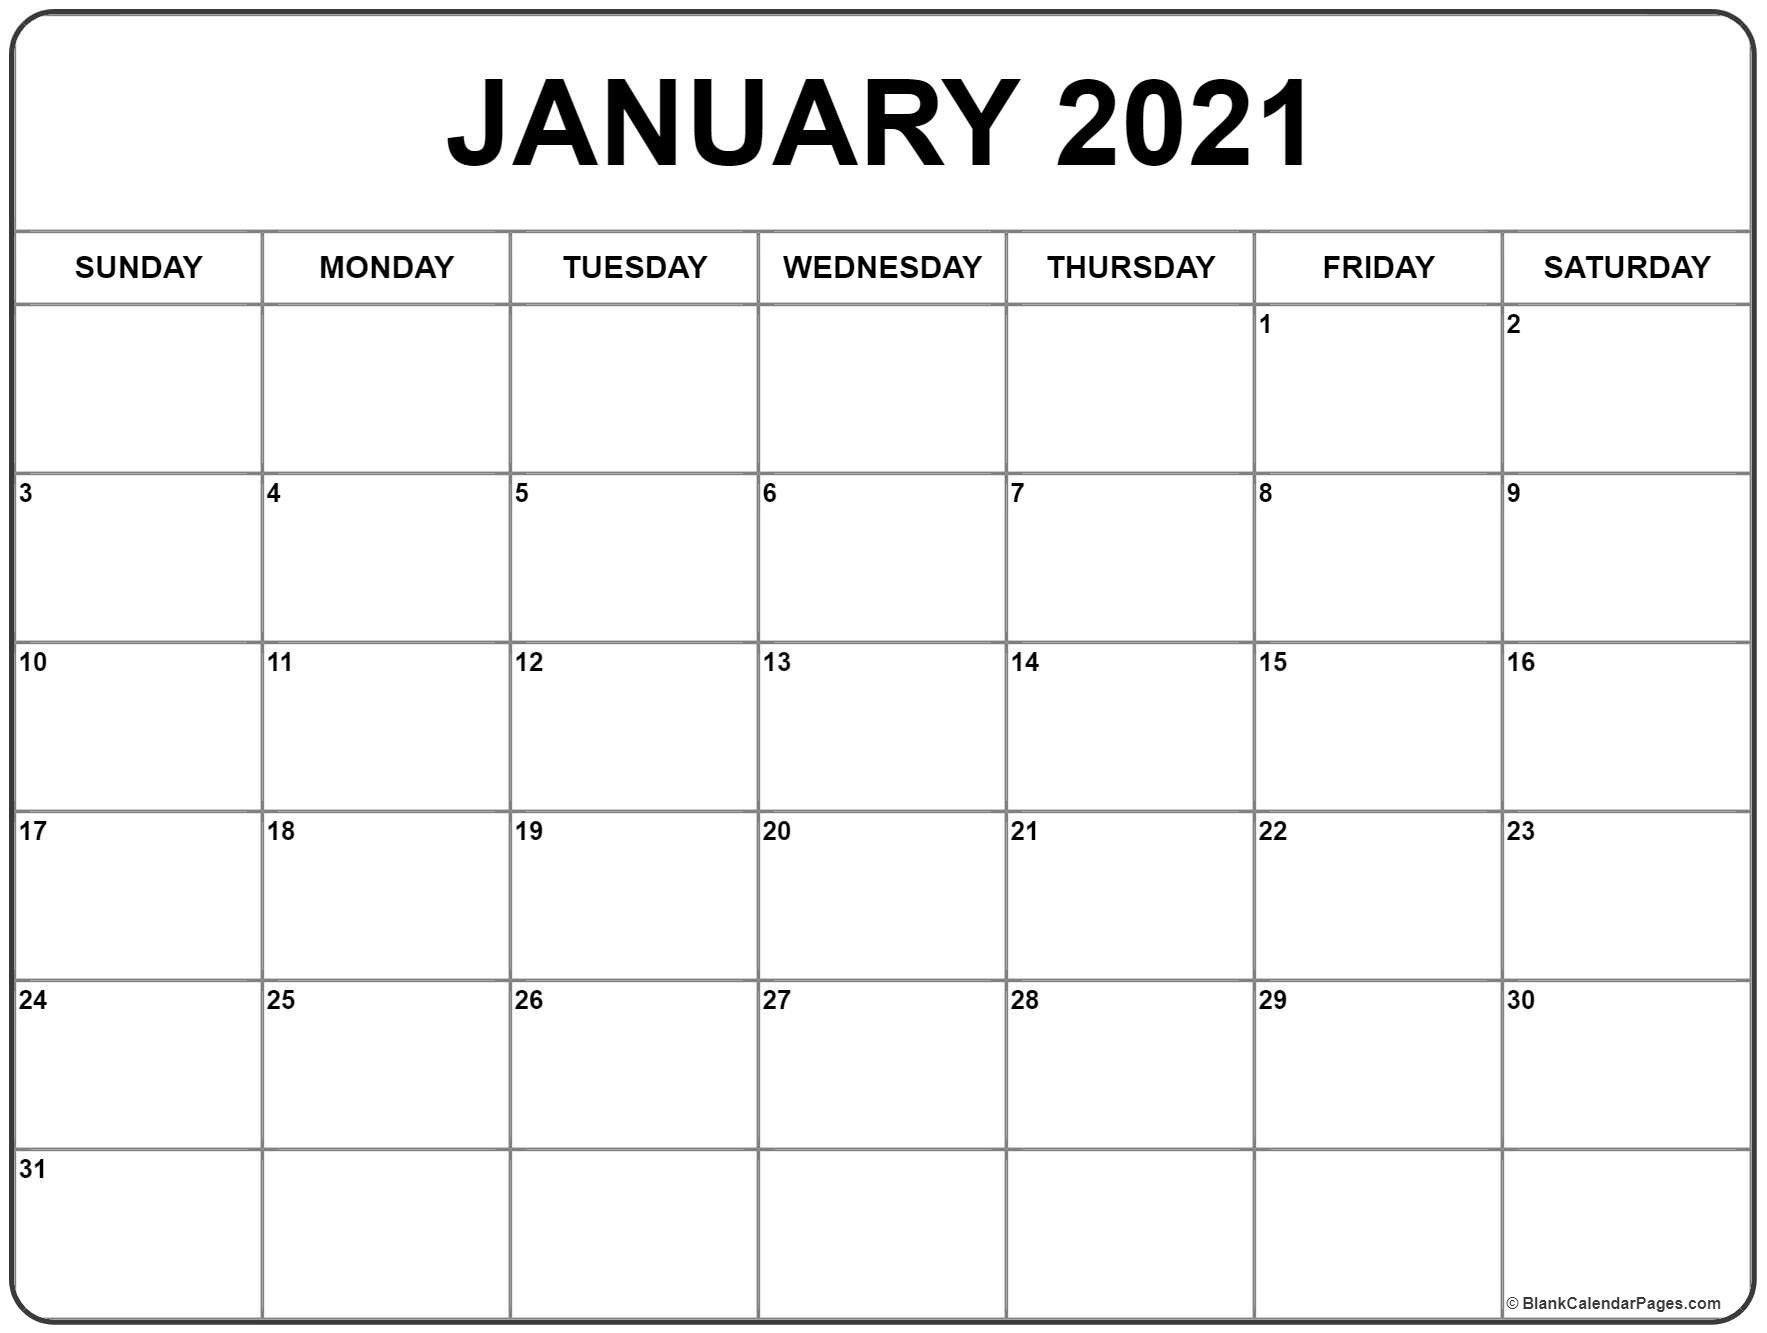 january 2021 calendar printable in 2020 | august calendar